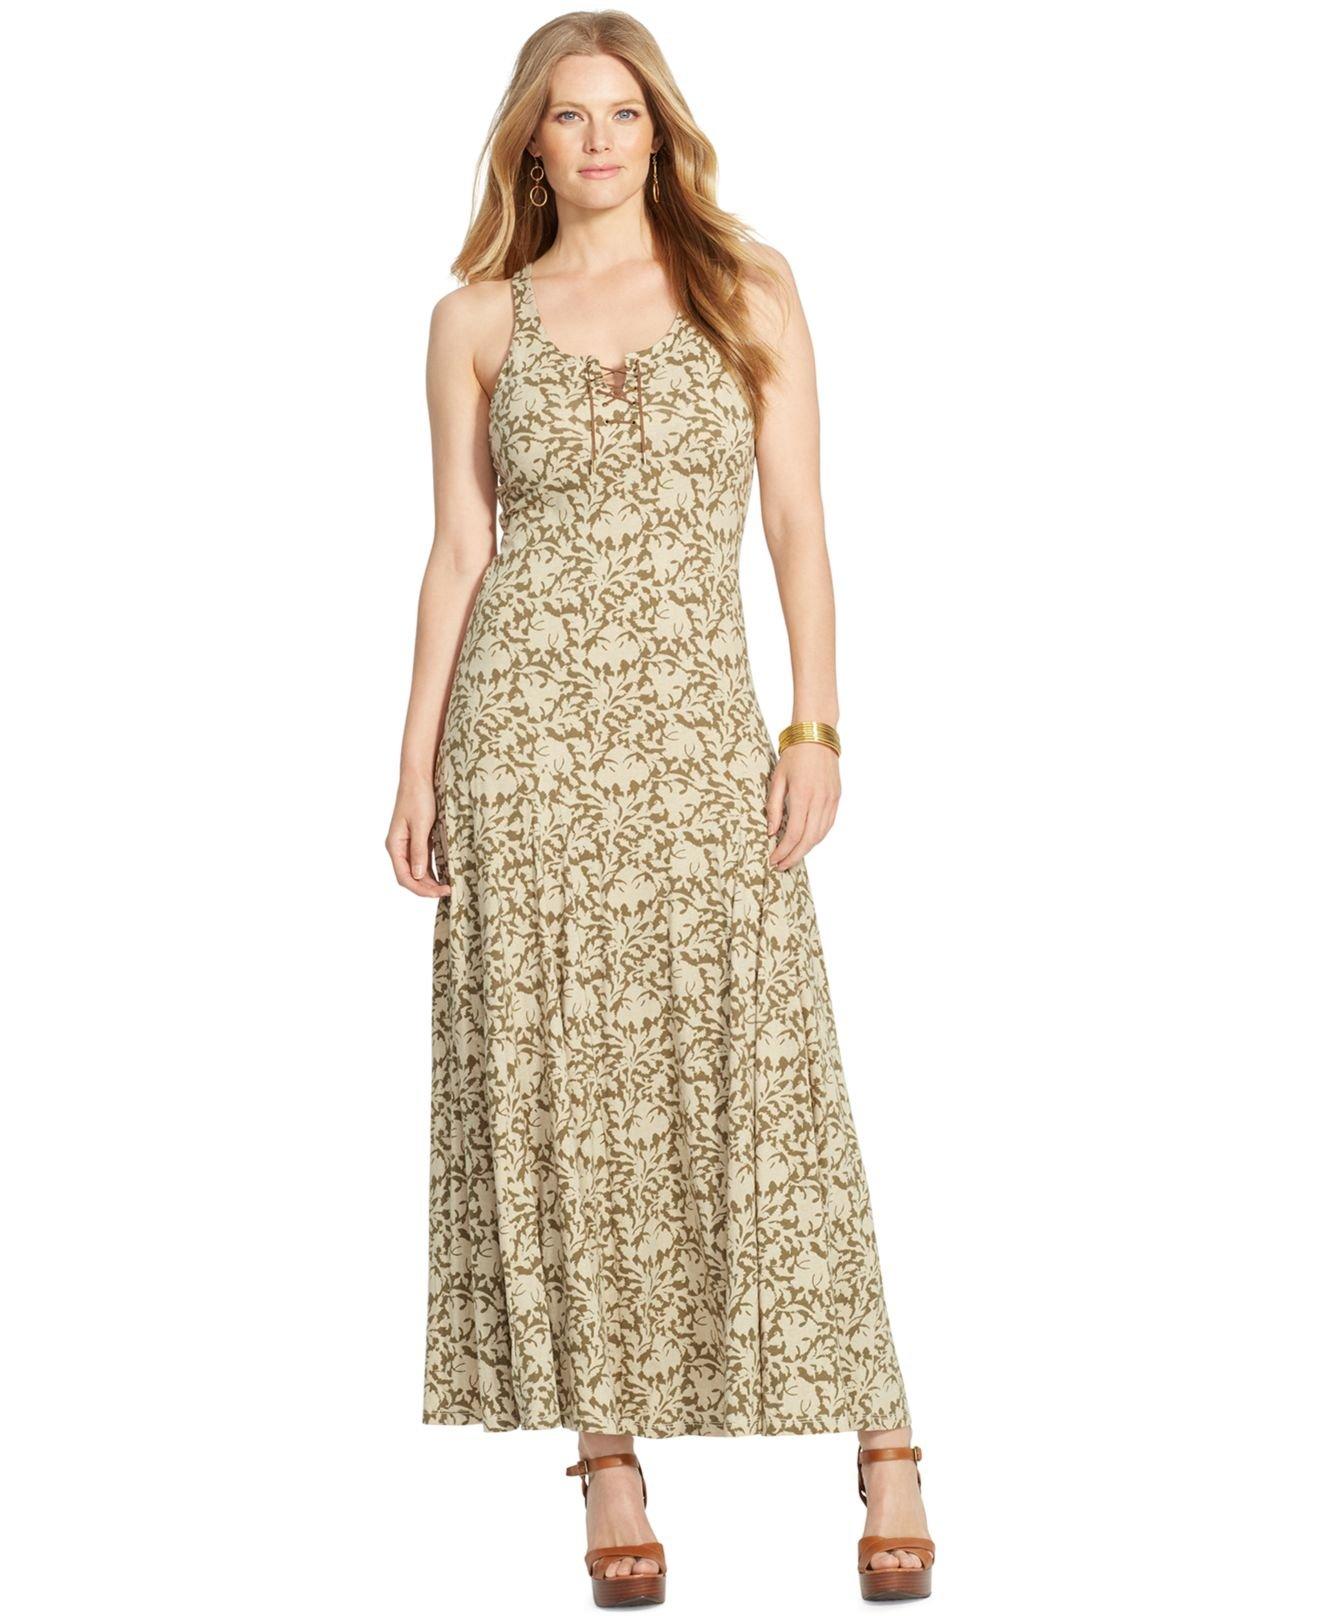 Lyst Lauren By Ralph Lauren Plus Size Lace Up Maxi Dress In Green